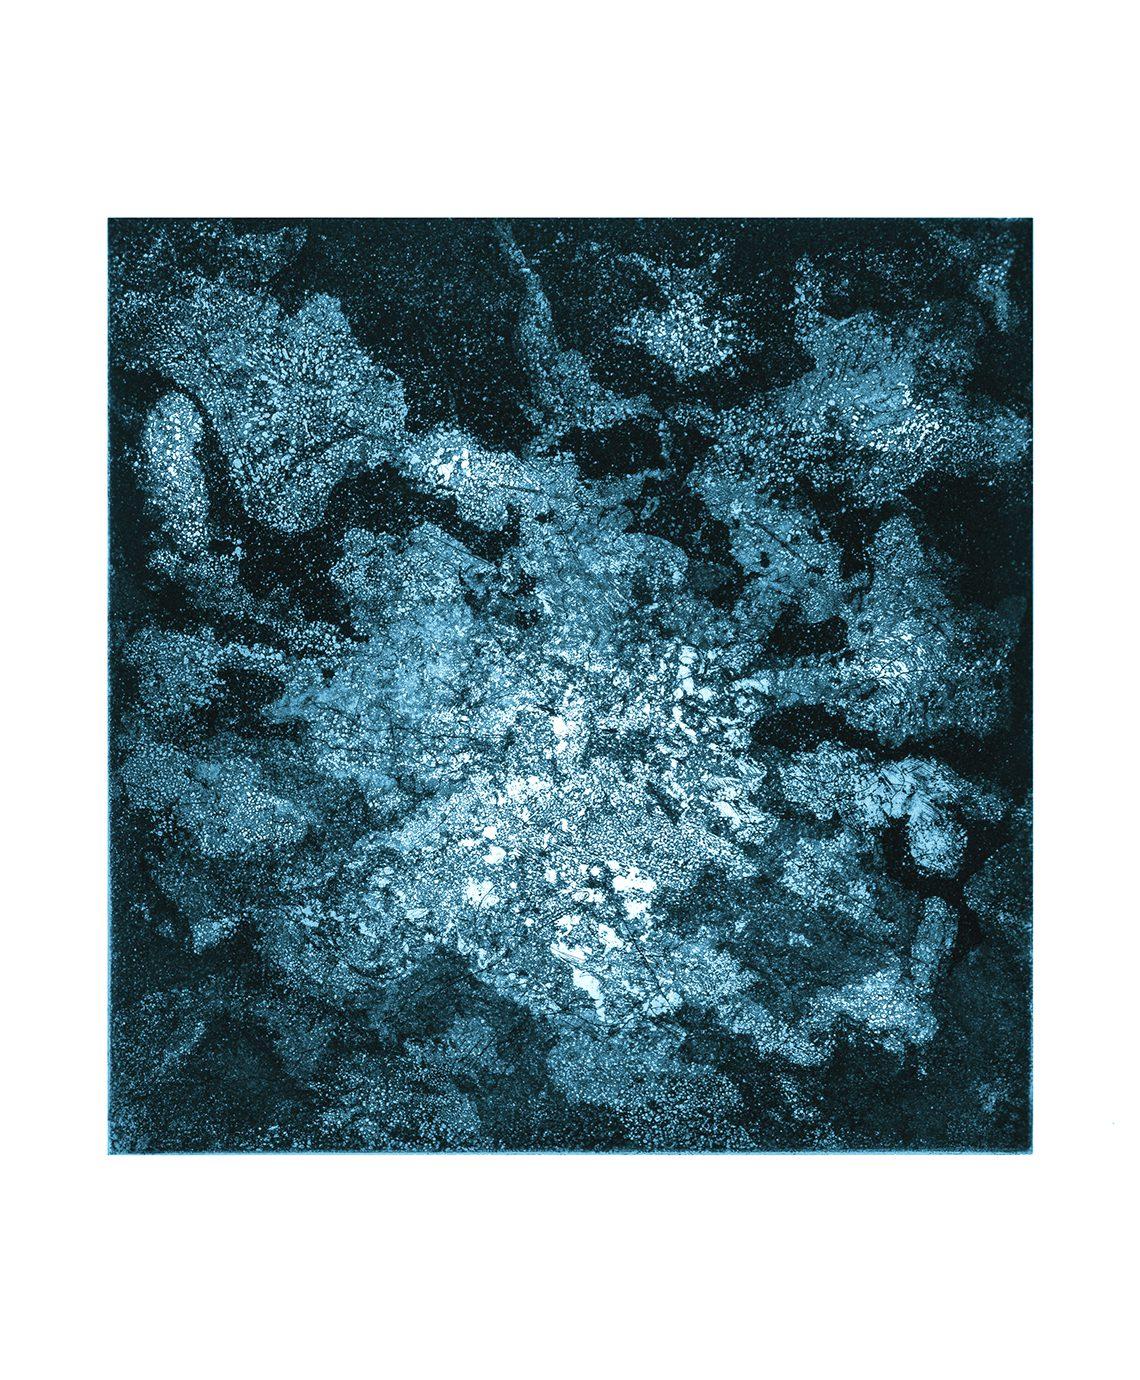 Chope de Luz (Silberpappel), 2014. Aquatinta on paper, 20 x 20 cm Unique: Framed.